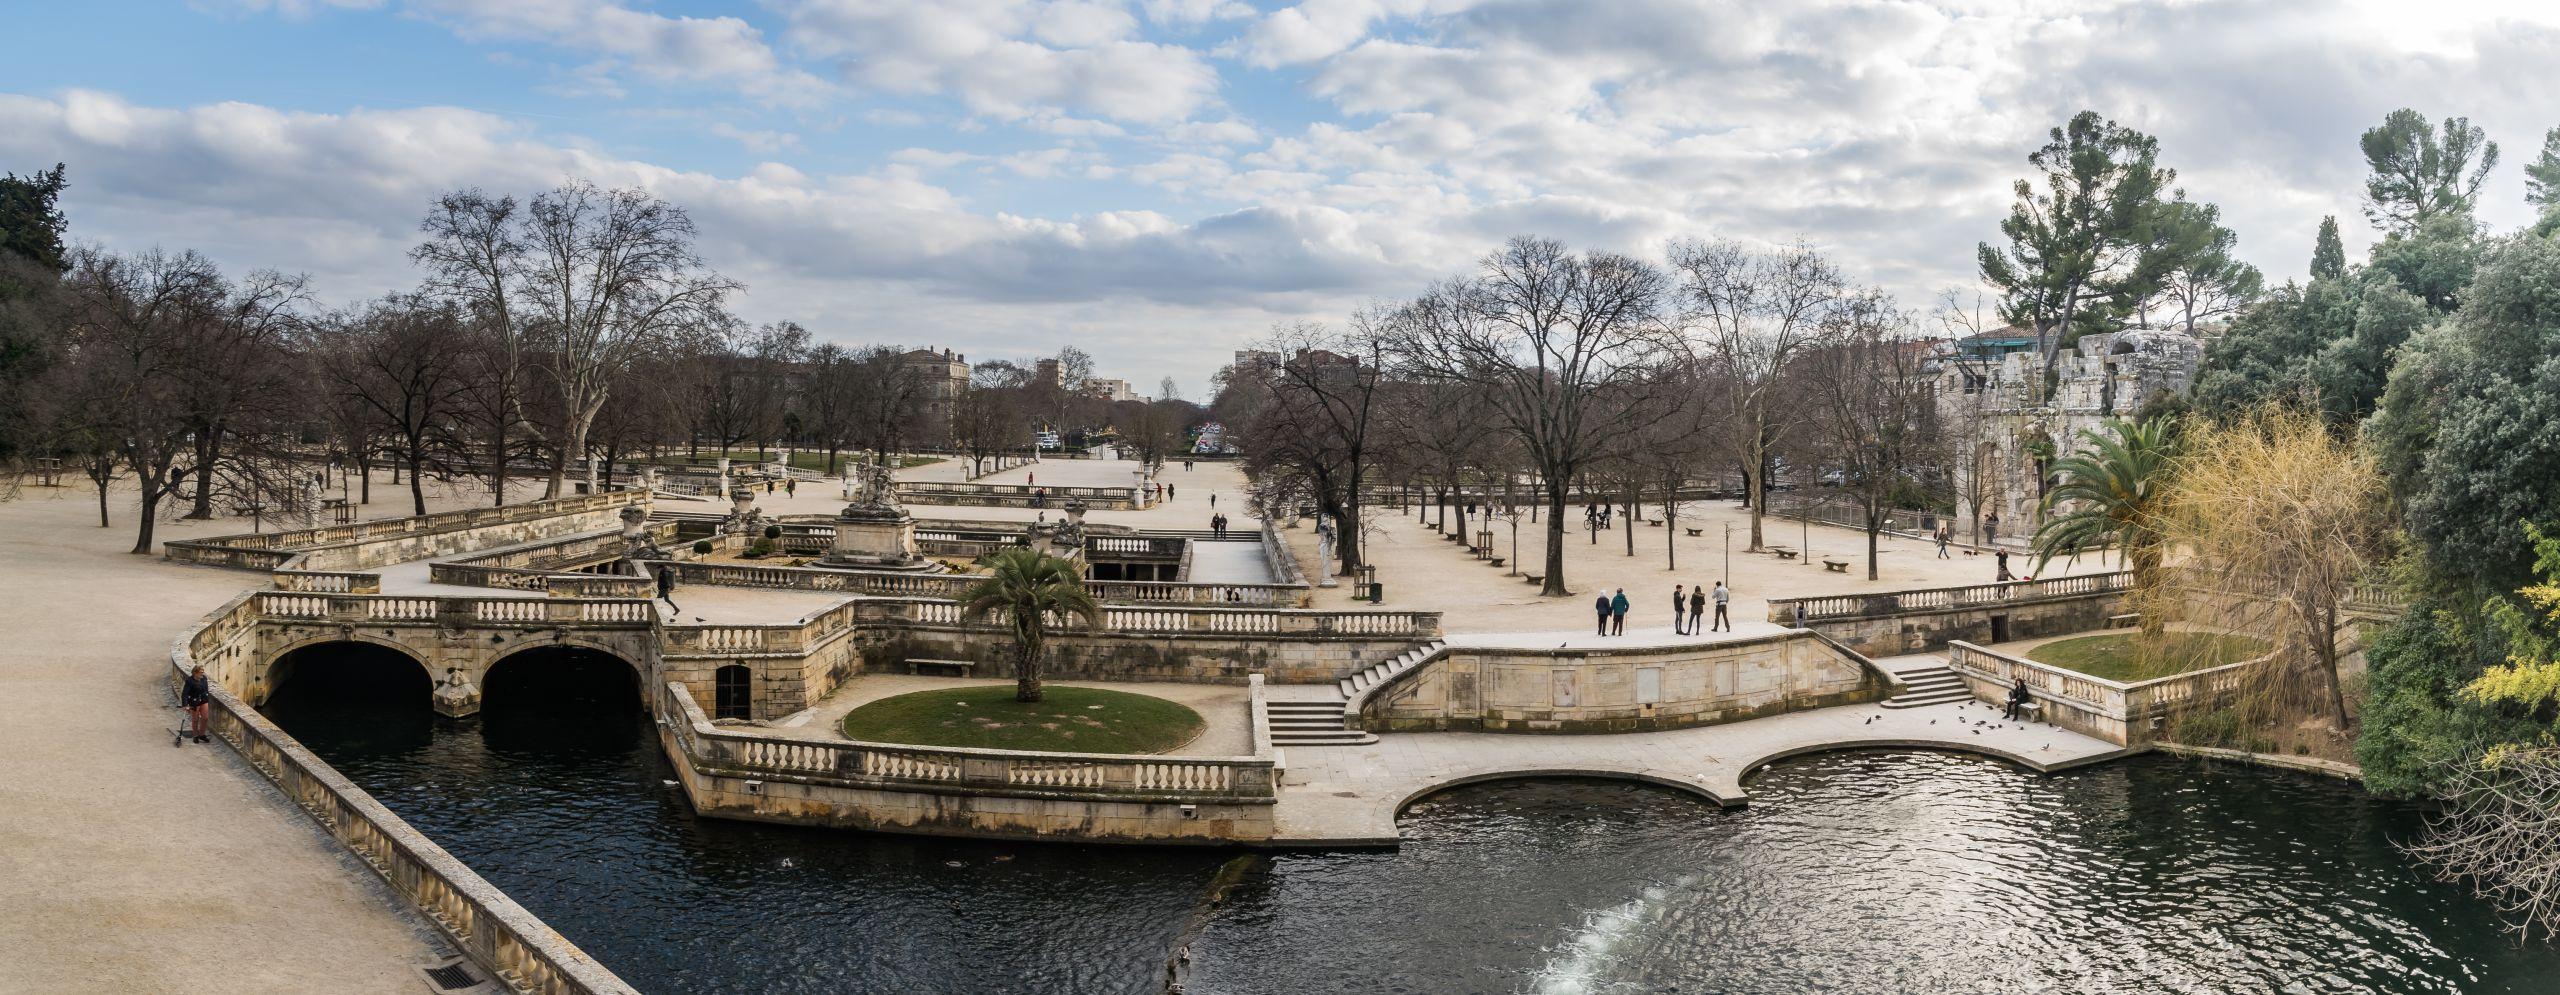 Jardins de la Fontaine in Nimes 11